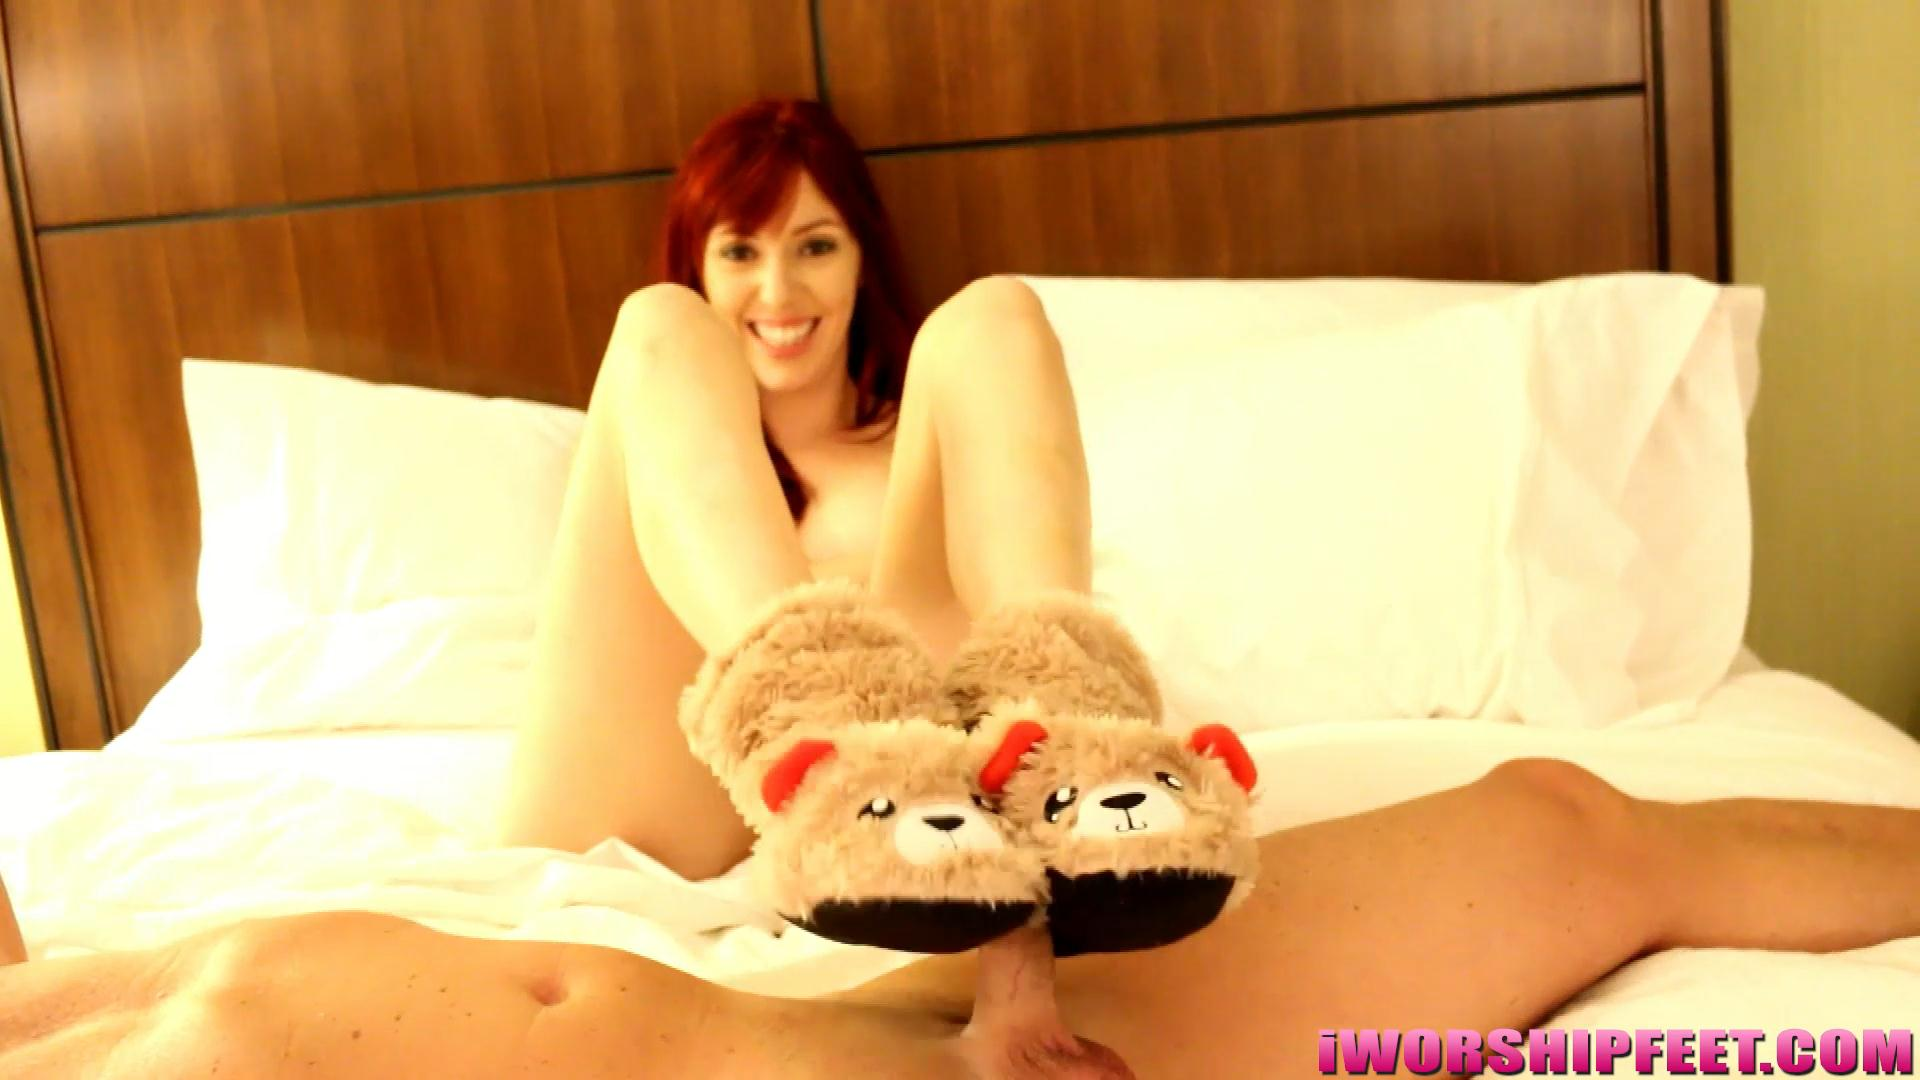 Animal Footjob Porn a hot redhead with big feet - barely legal foot jobs